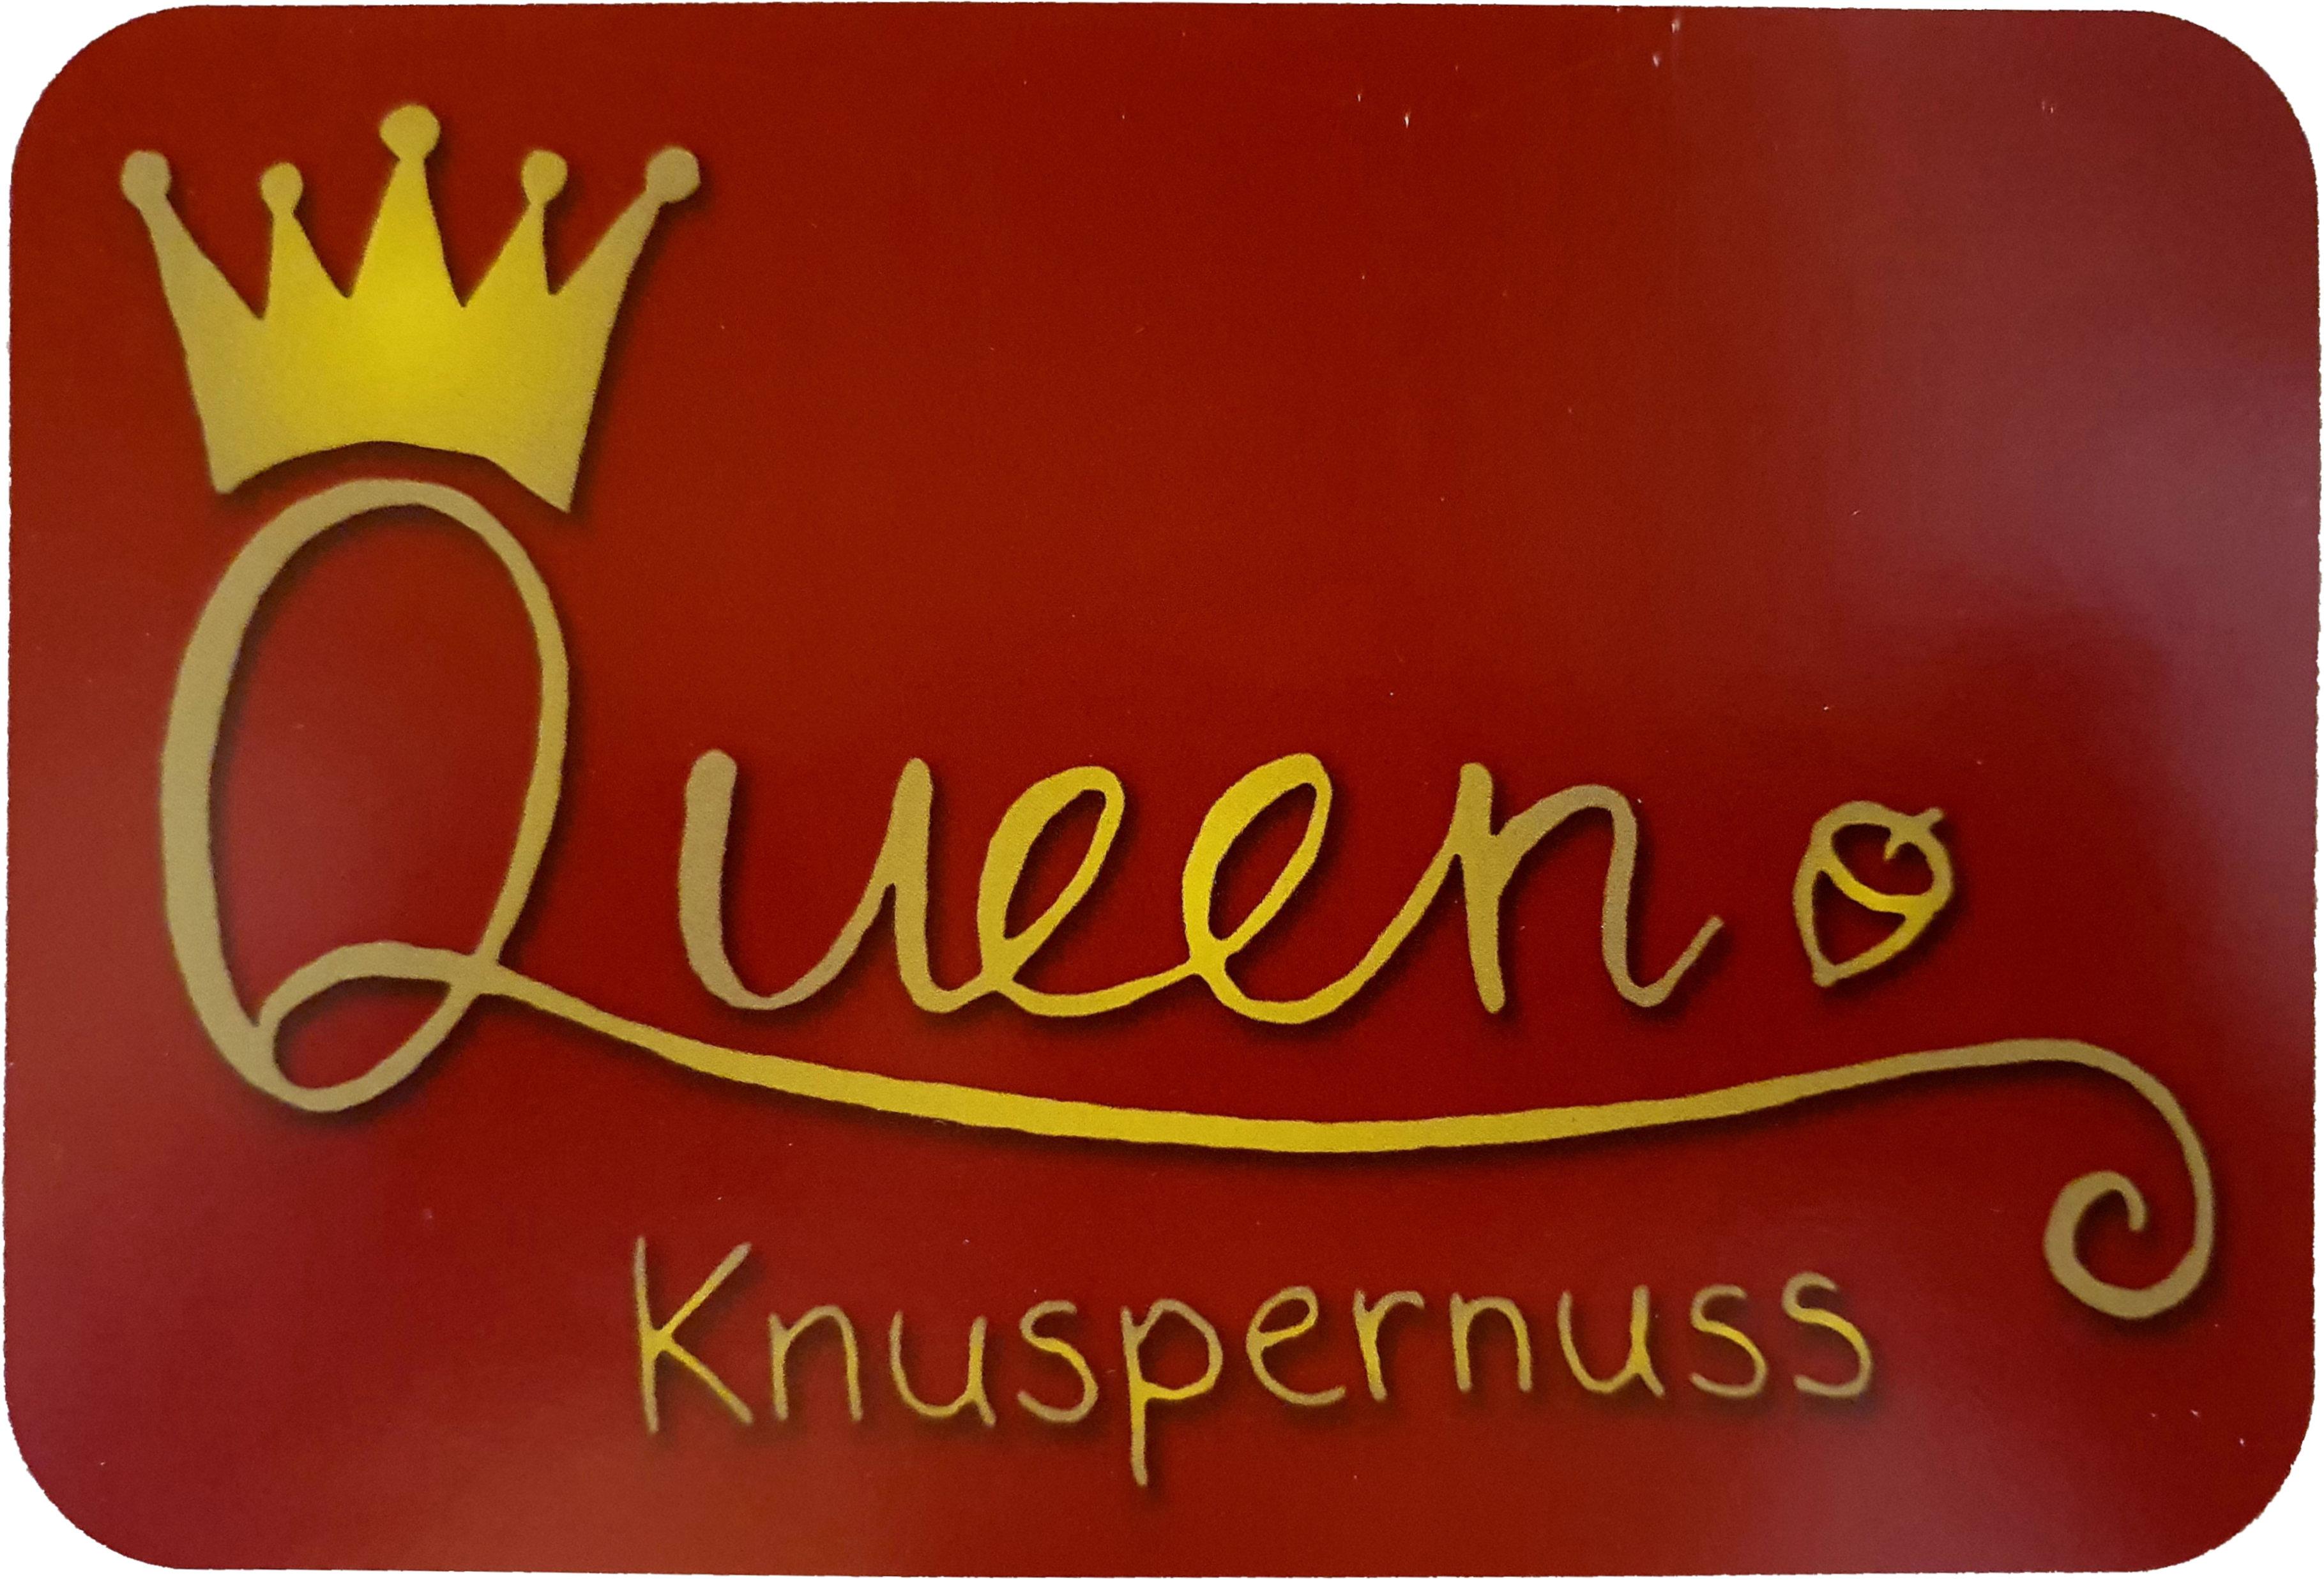 Queen Knuspernuss